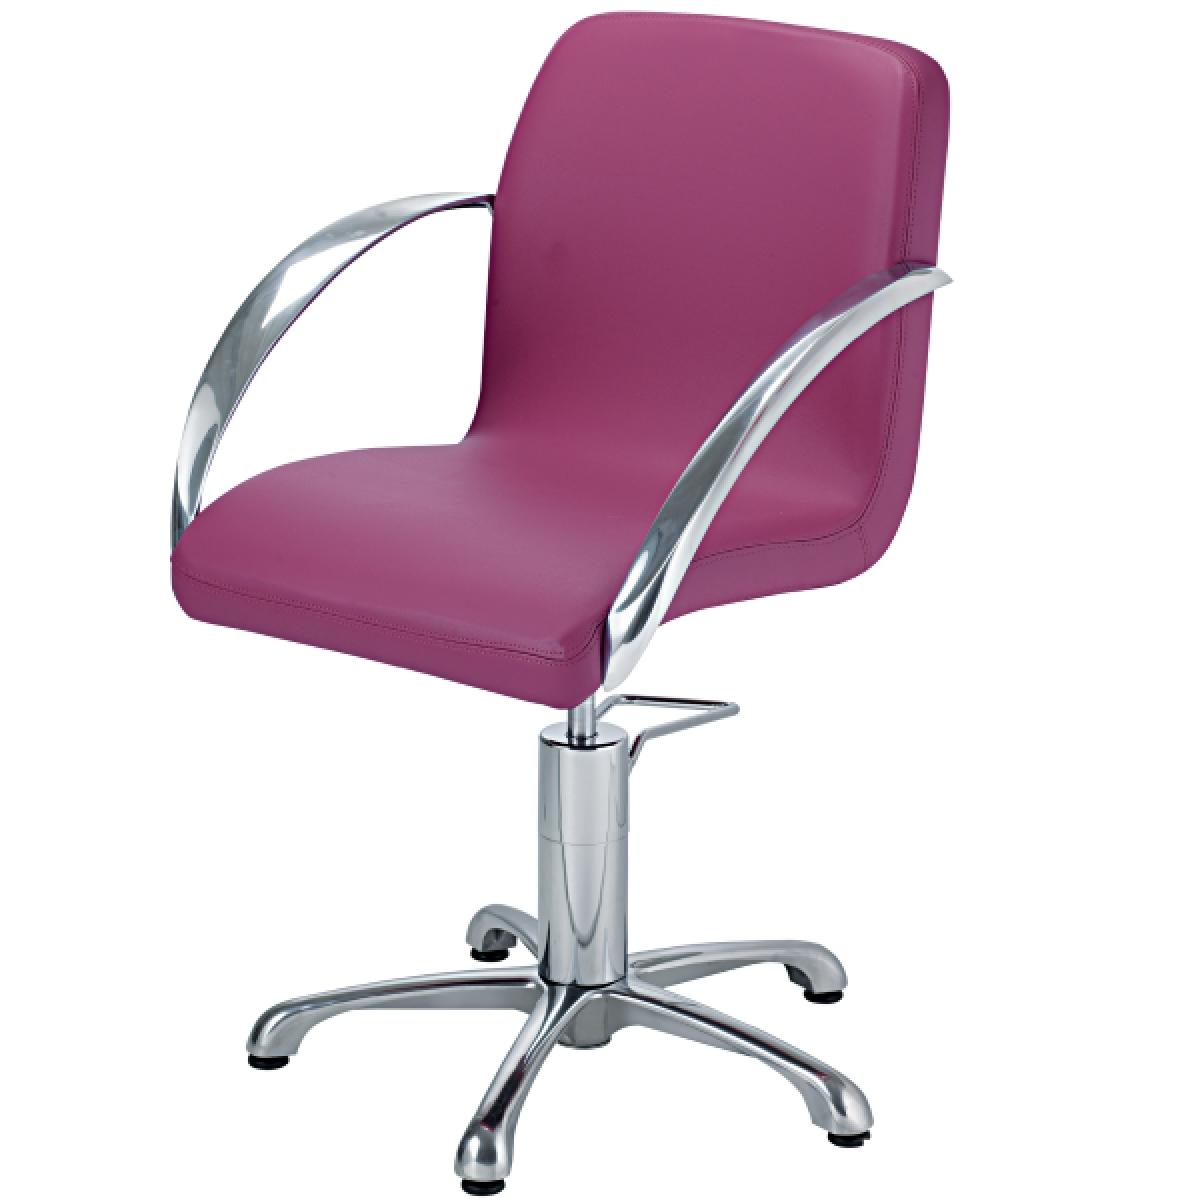 Ceriotti glorgia stylist chair regal hair salon supply for Colored salon chairs